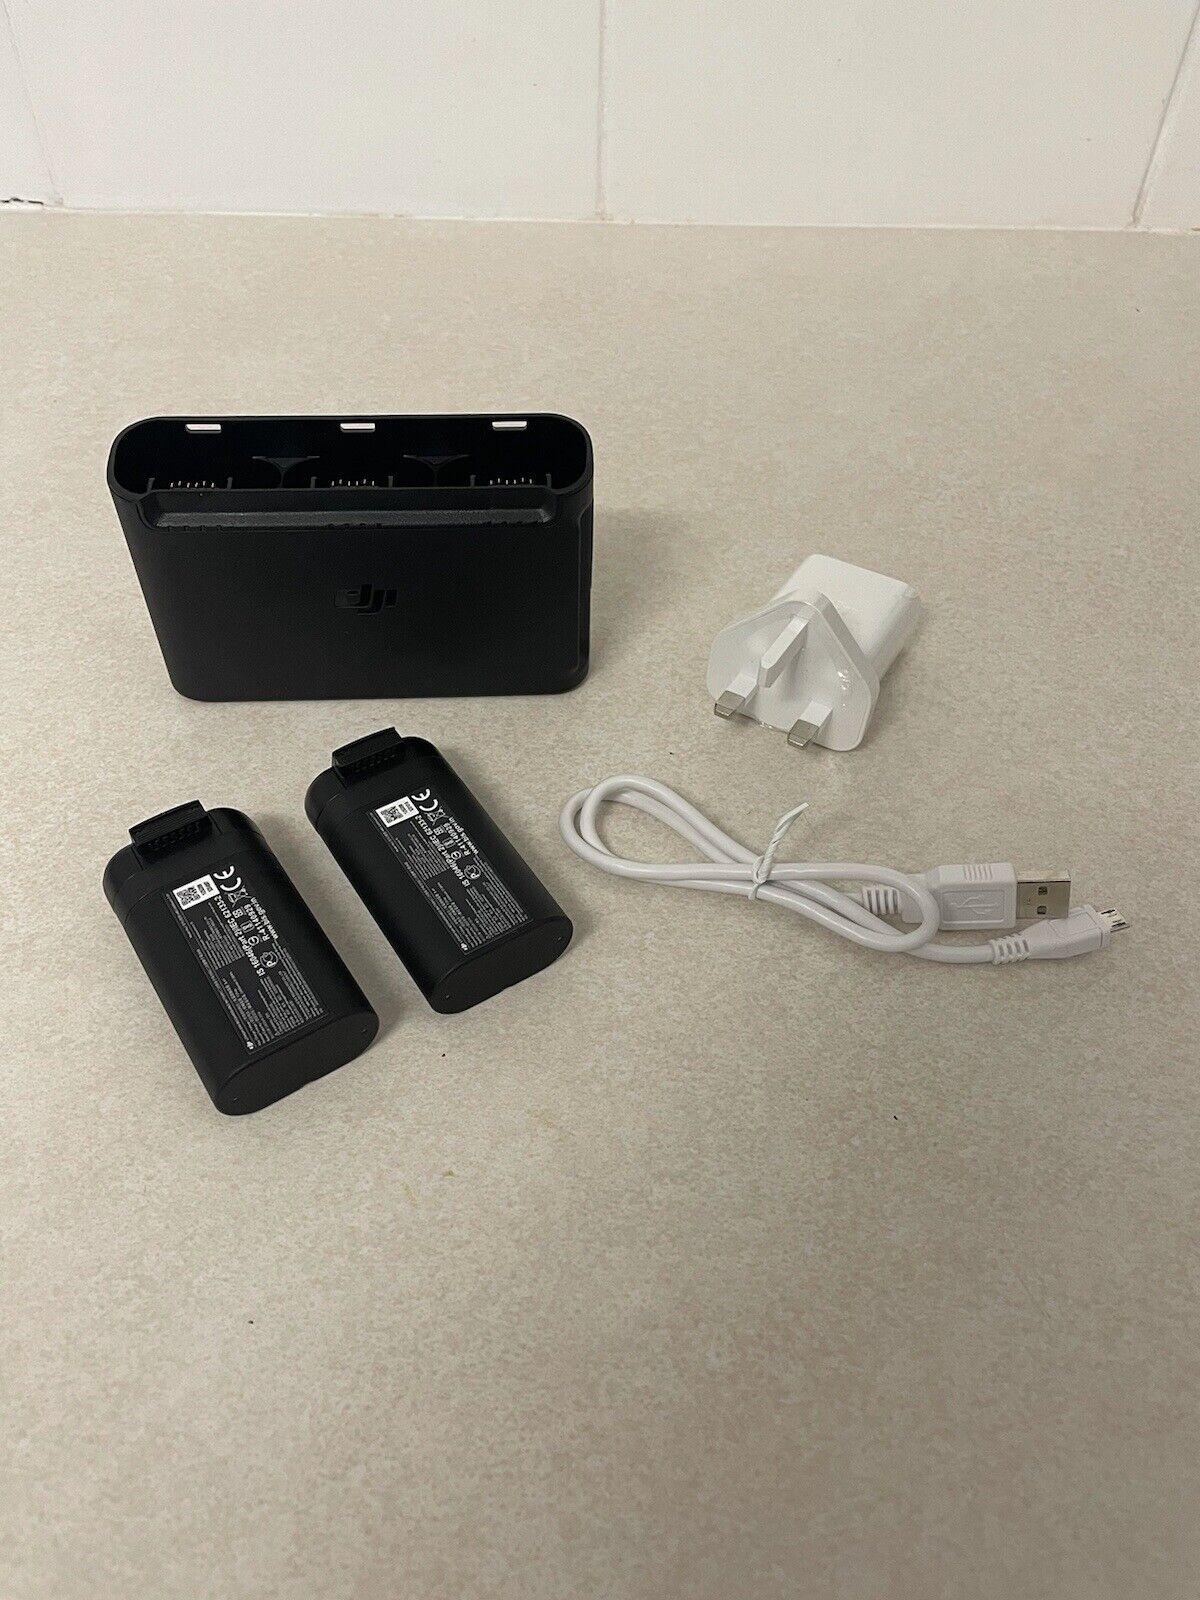 DJI Mavic Mini Intelligent Flight Battery / Batteries & Charger - Fly More Combo